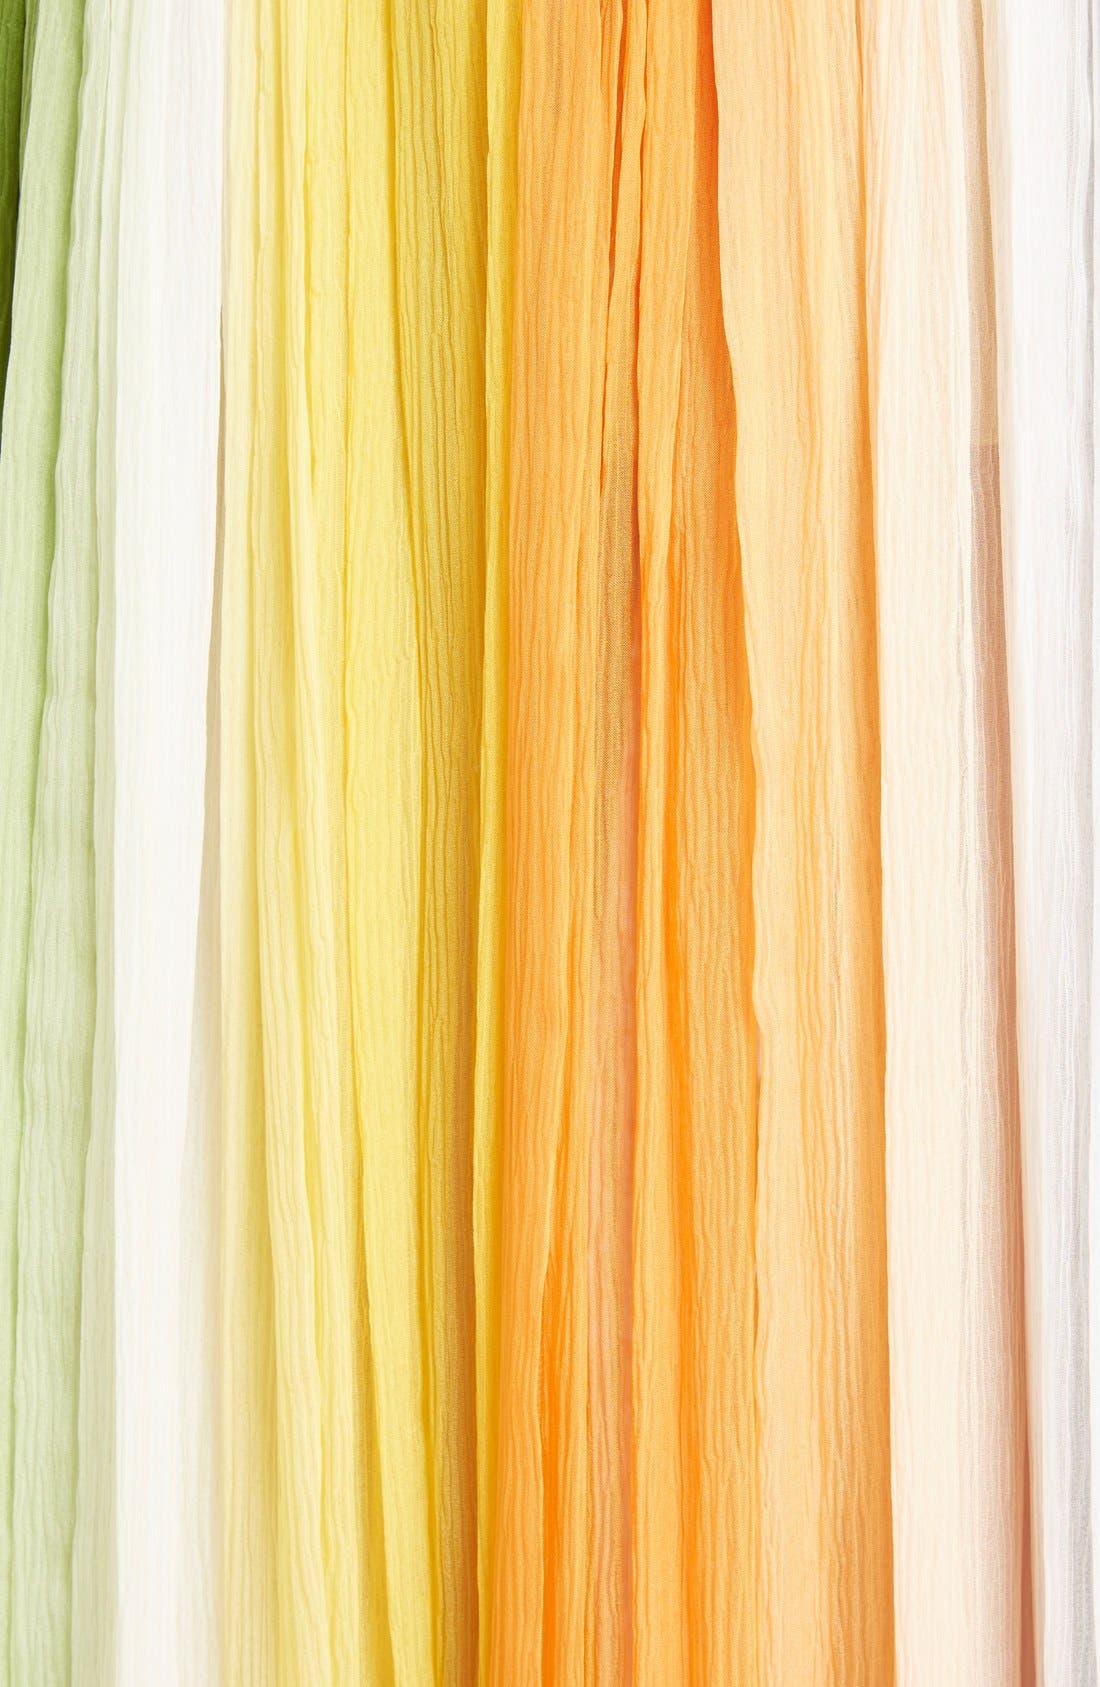 Stripe Pleated Silk Skirt with Tassels,                             Alternate thumbnail 4, color,                             Orange/ Green